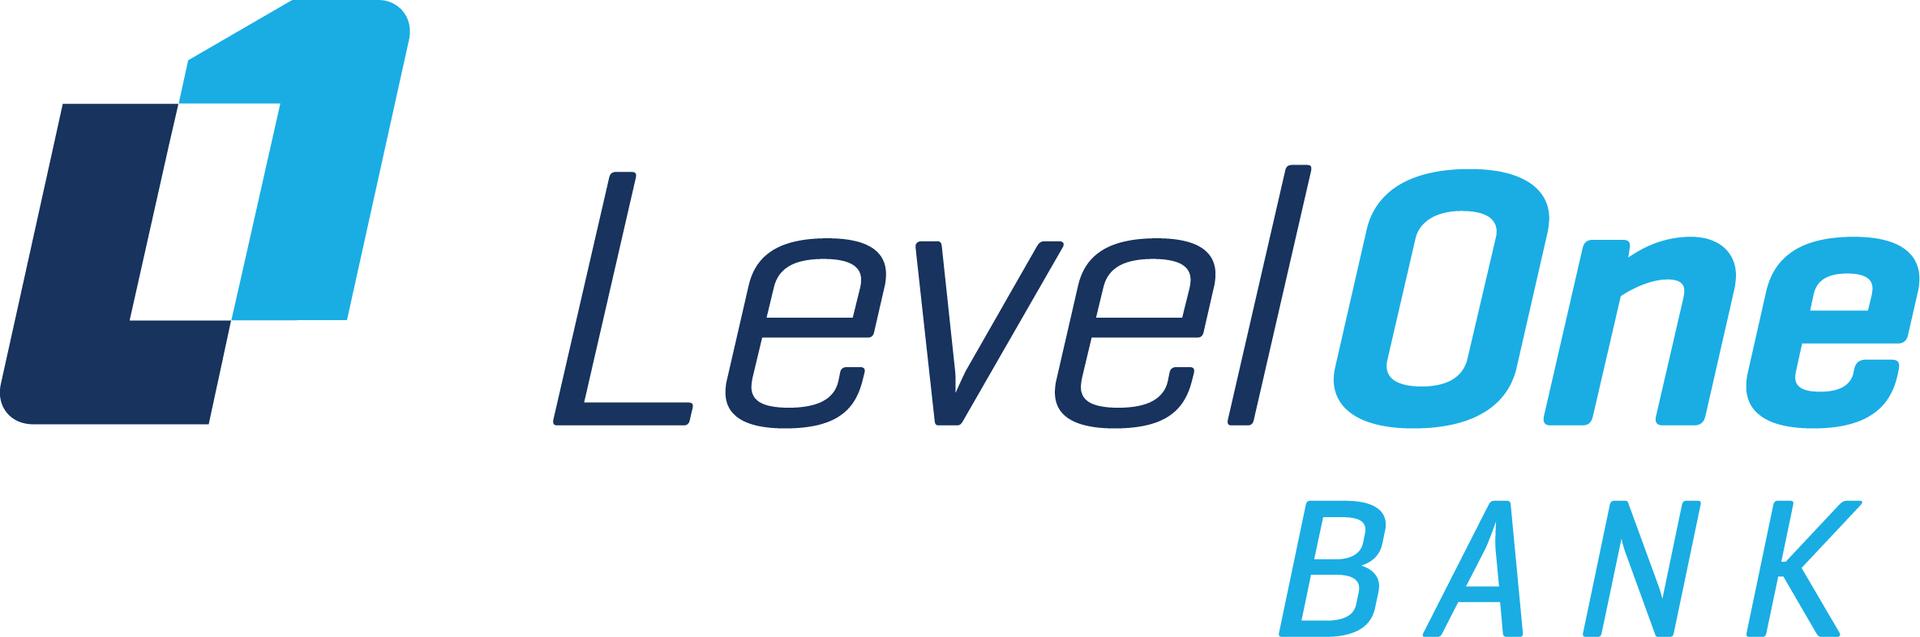 Level One Bank Logo.tif